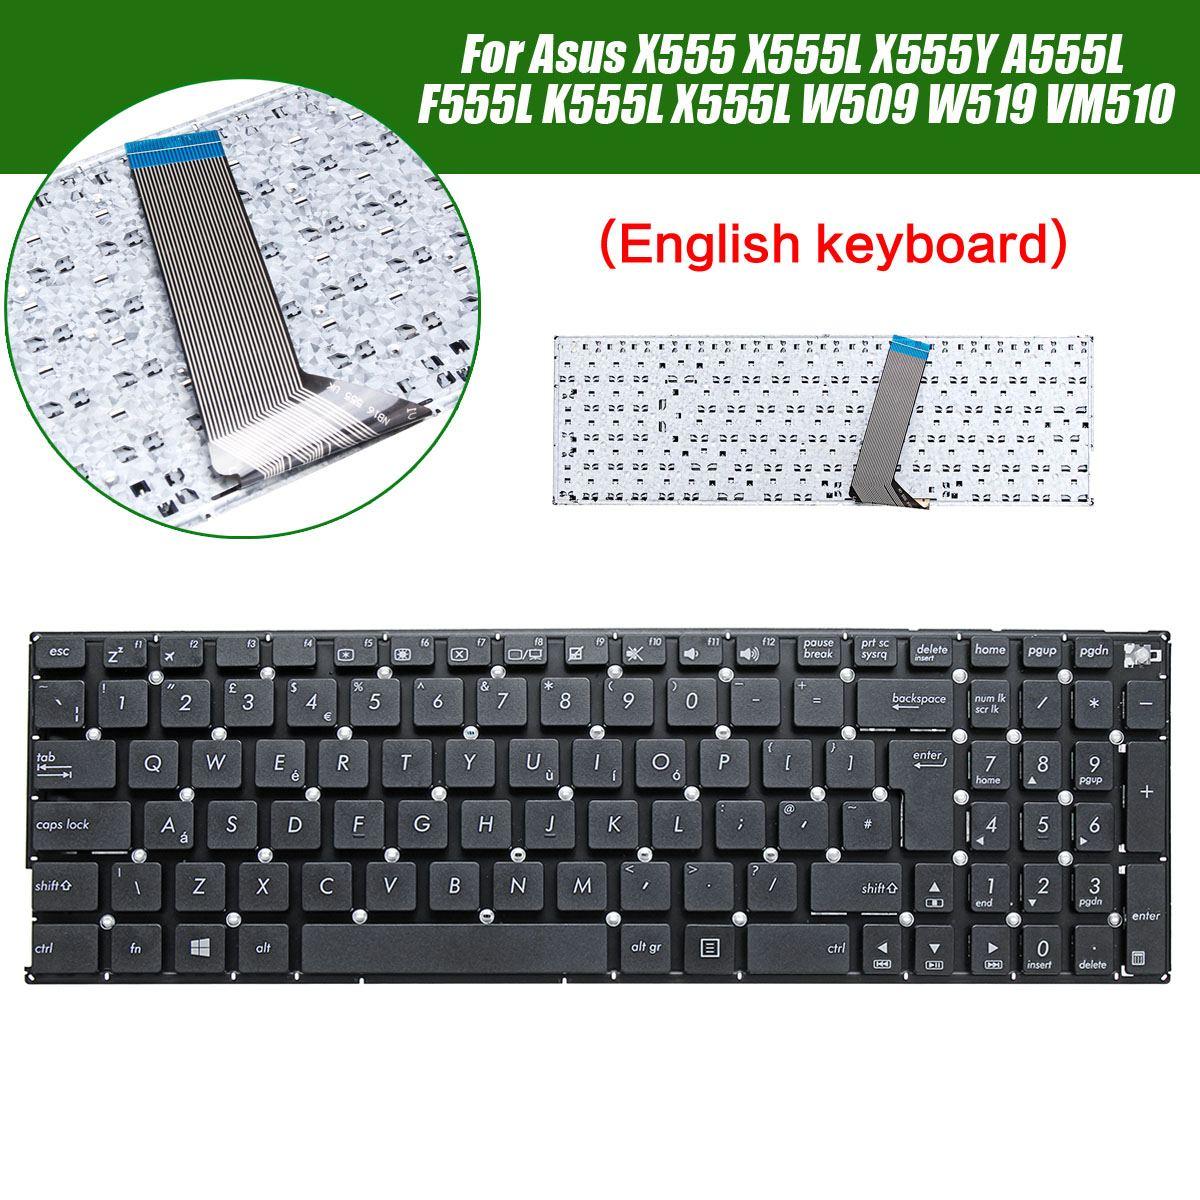 Laptop Keyboard For Asus X555 X555L X555Y A555L F555L K555L X555L W519 VM510 English Replacement Standard Keyboard